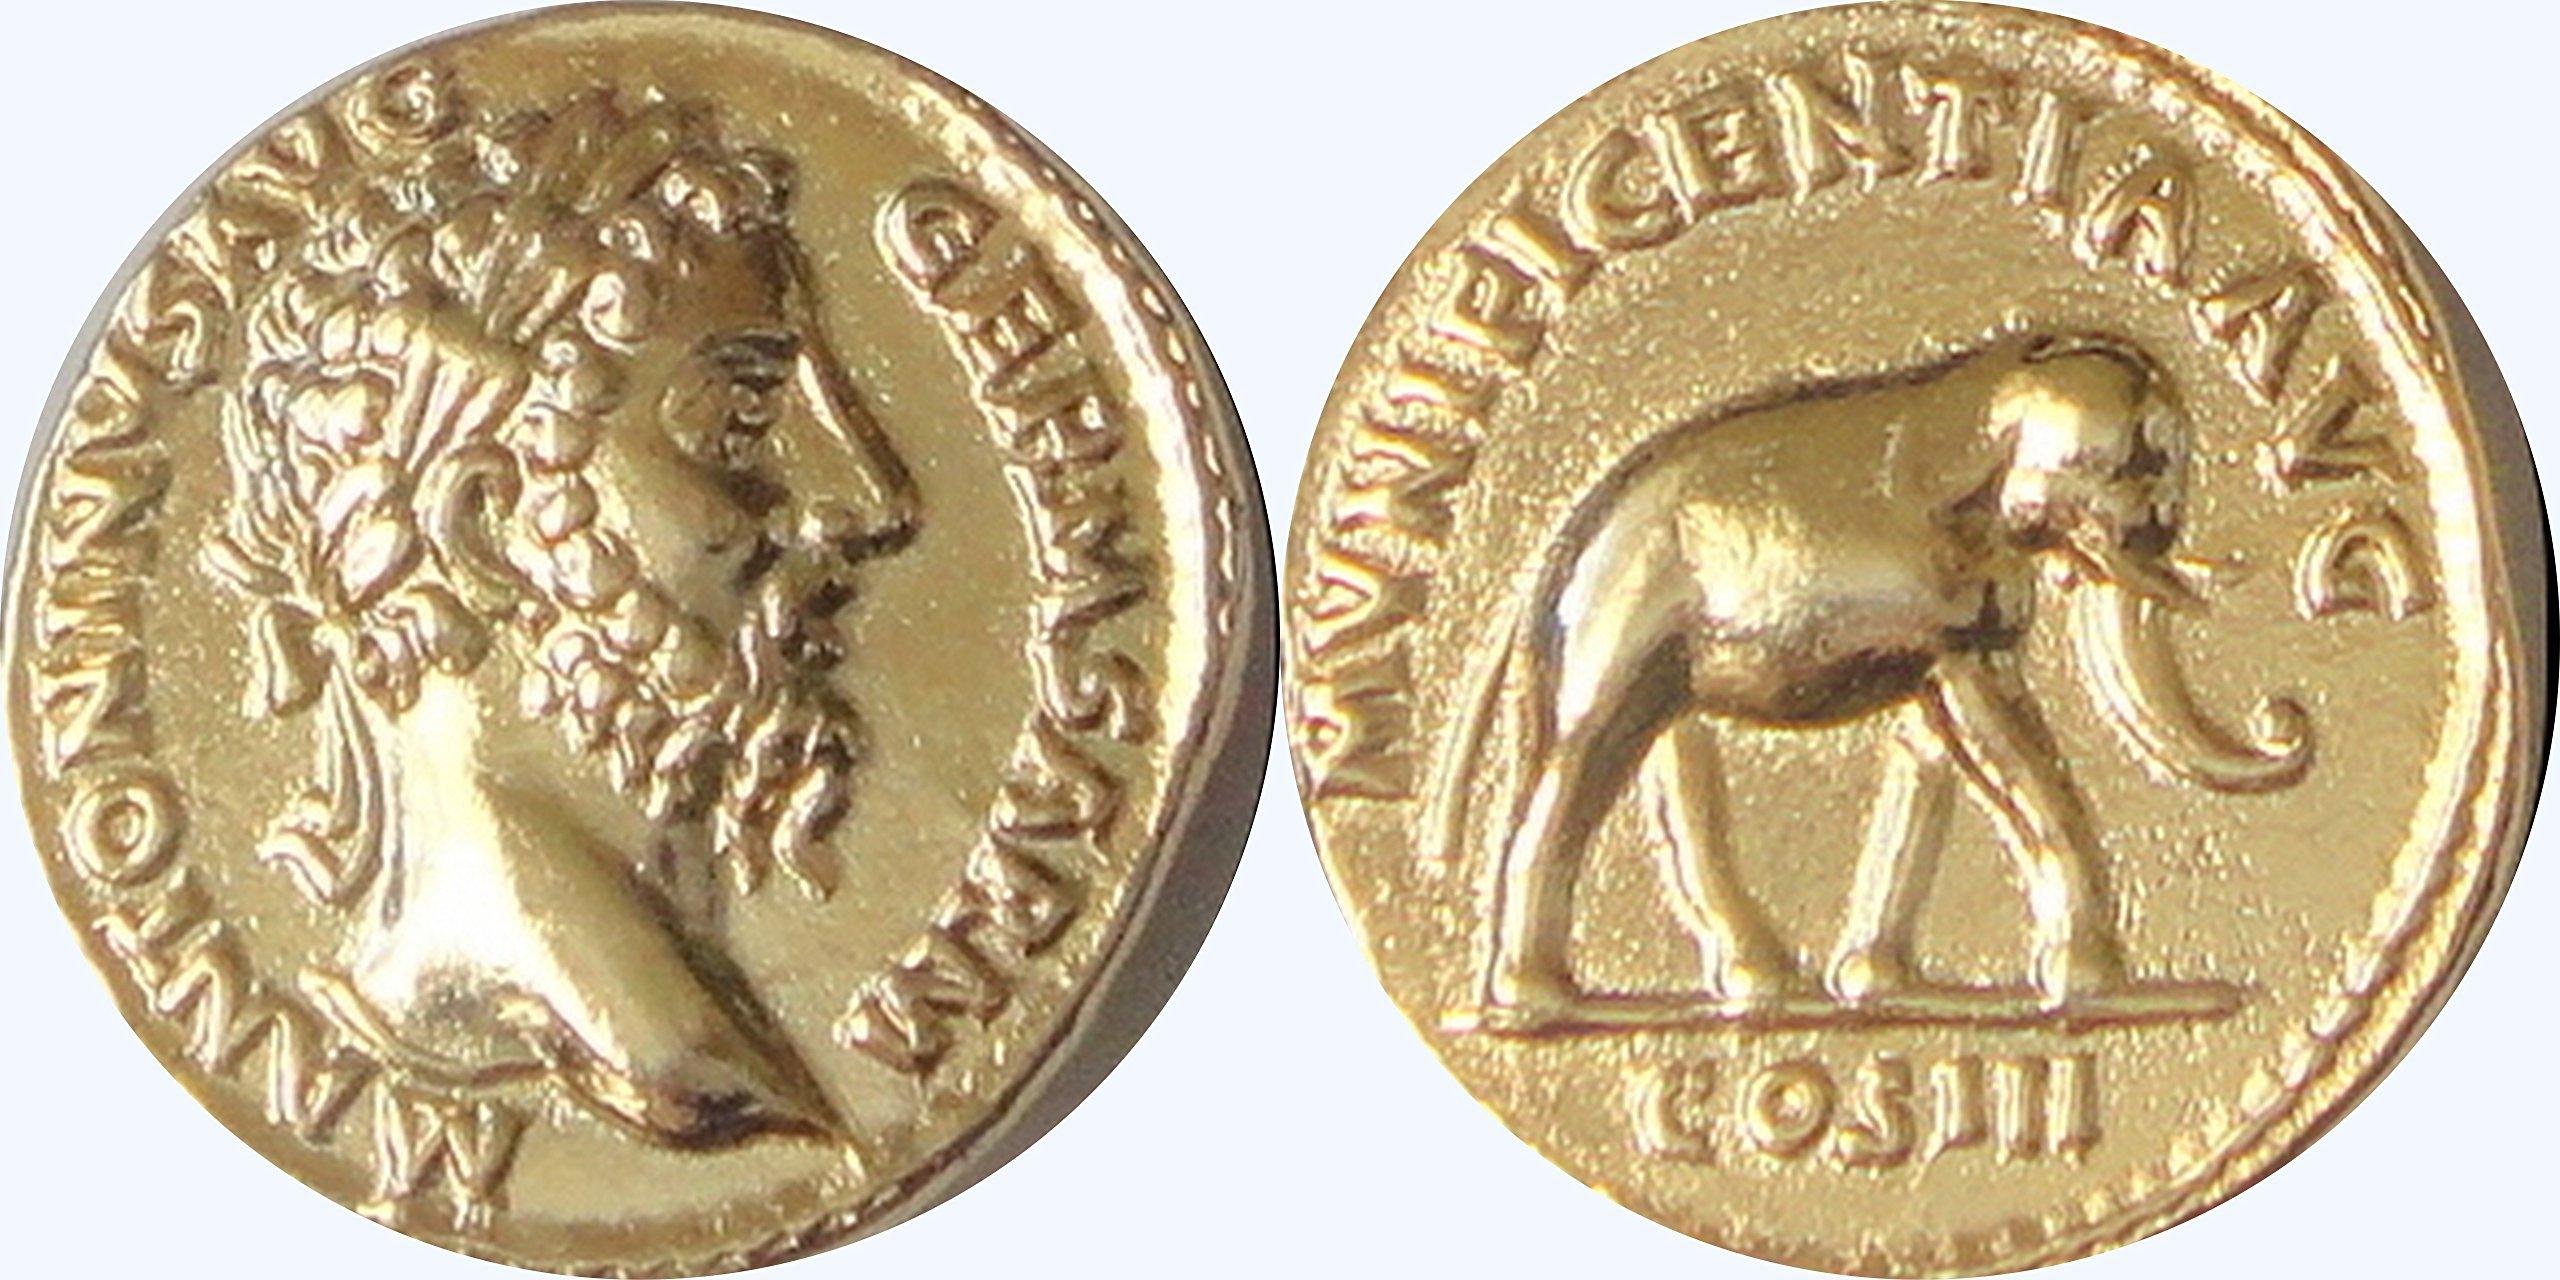 Roman Empire, Marcus Aurelius Coin, Philosopher King, Famous Roman Coin Collection # 26G,